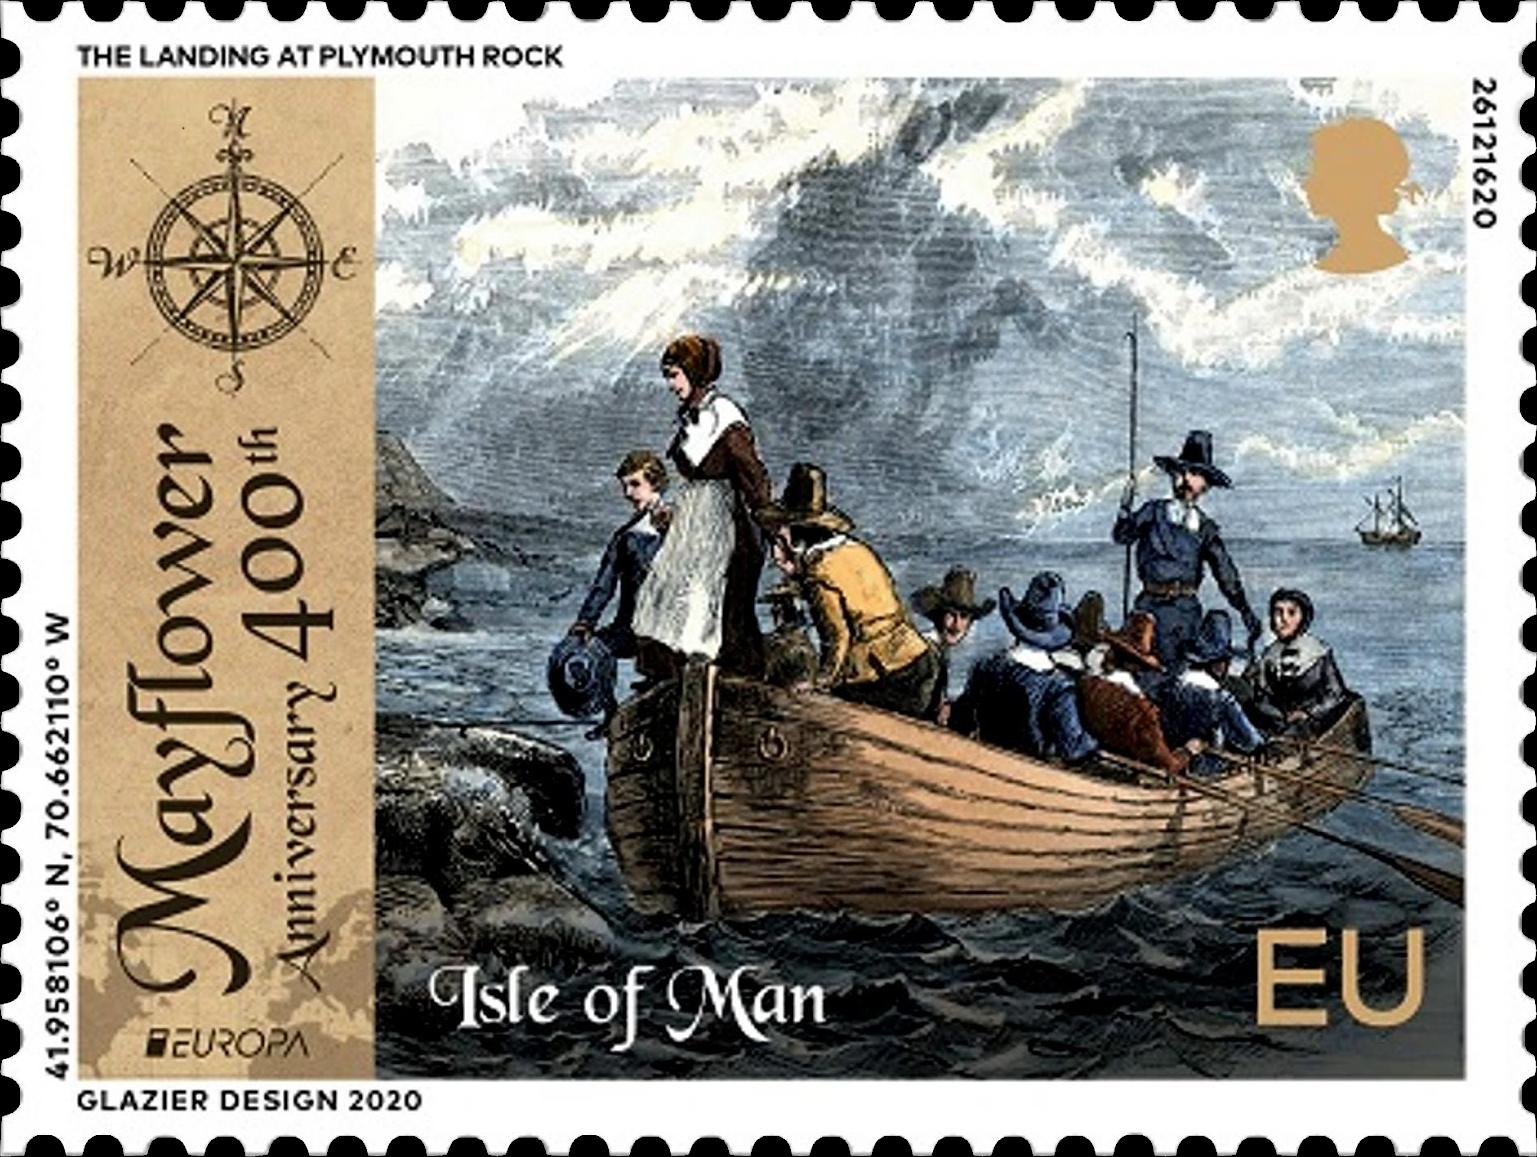 New Issues 2020: Isle Of Man (EUROPA / Mayflower) – Philatelic Pursuits